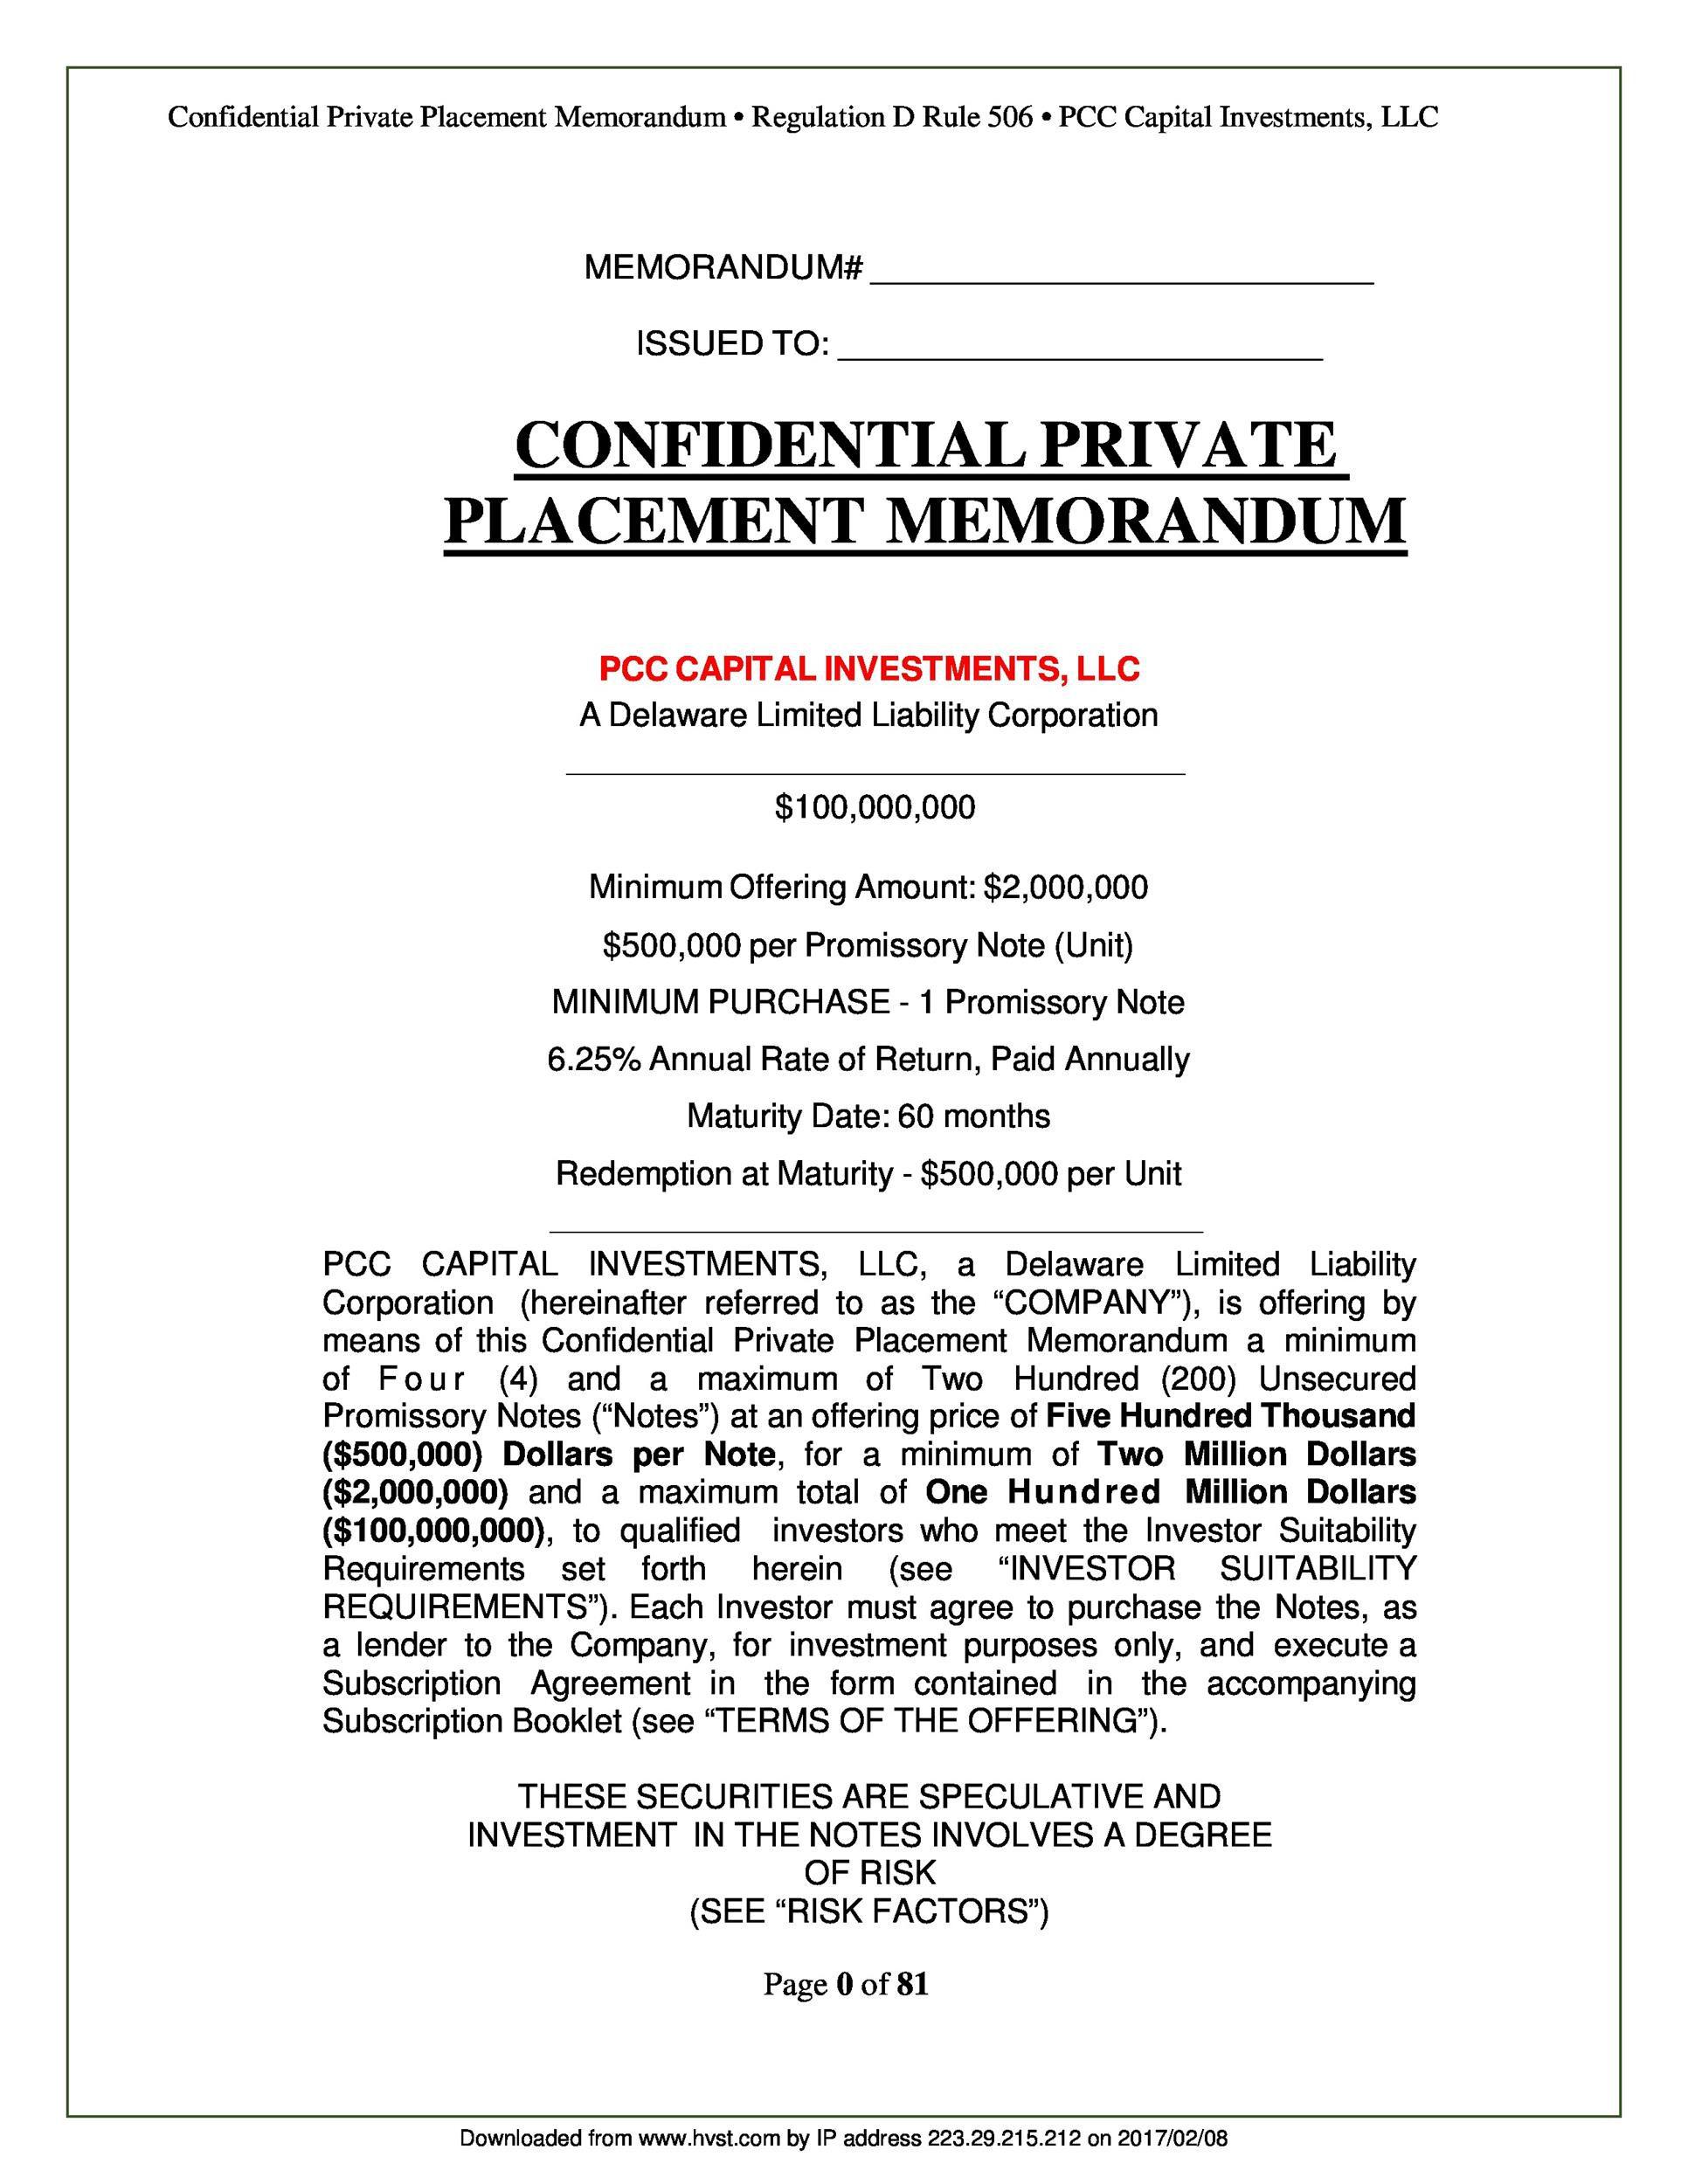 004 Excellent Free Private Placement Memorandum Template Highest Clarity Full